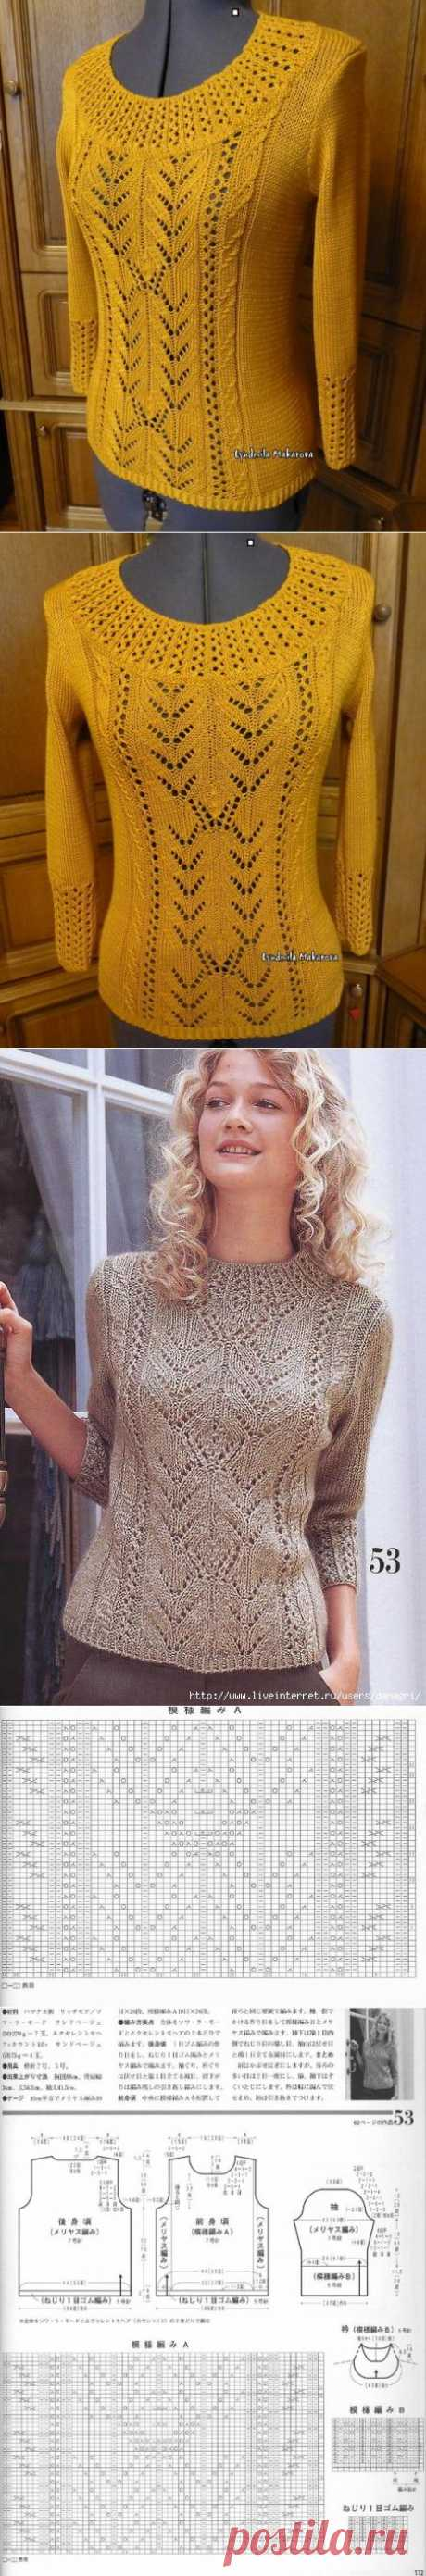 Пуловер спицами..